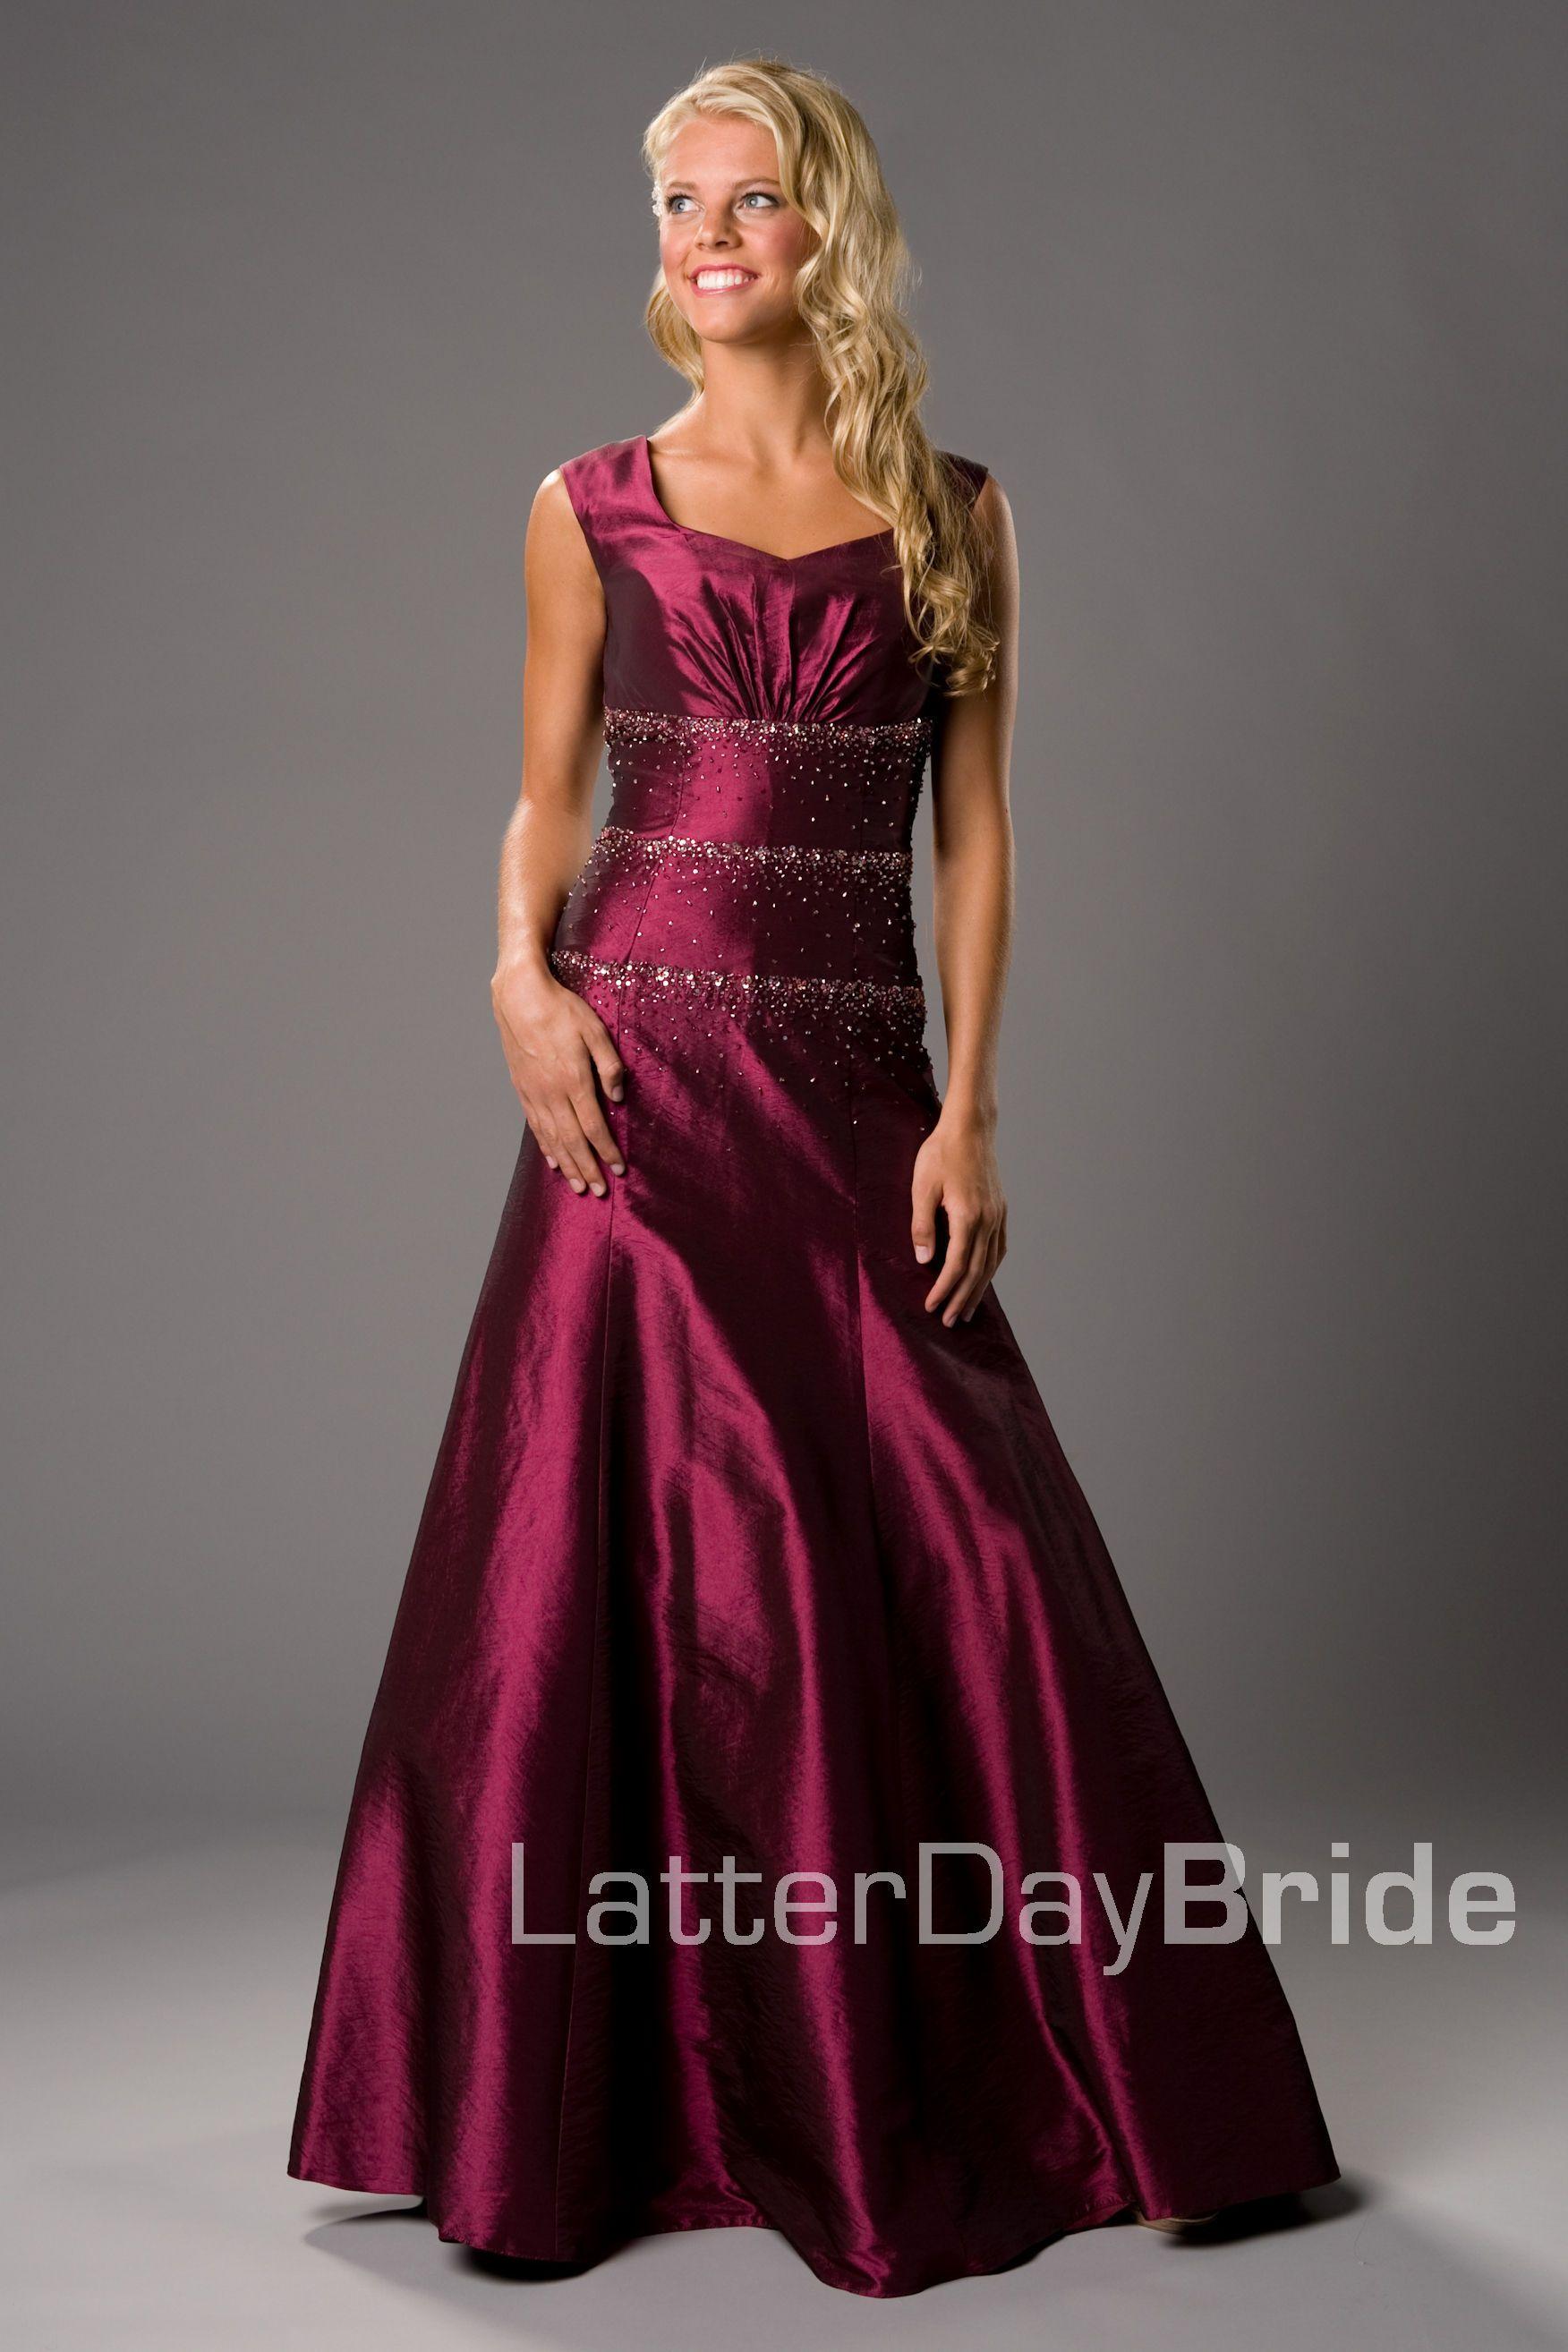 Bridesmaid Prom Callie Latterdaybride Prom I Love This Prom Dress Soooo Much Dresses Prom Dresses Modest Modest Bridesmaid Dresses [ 2628 x 1752 Pixel ]